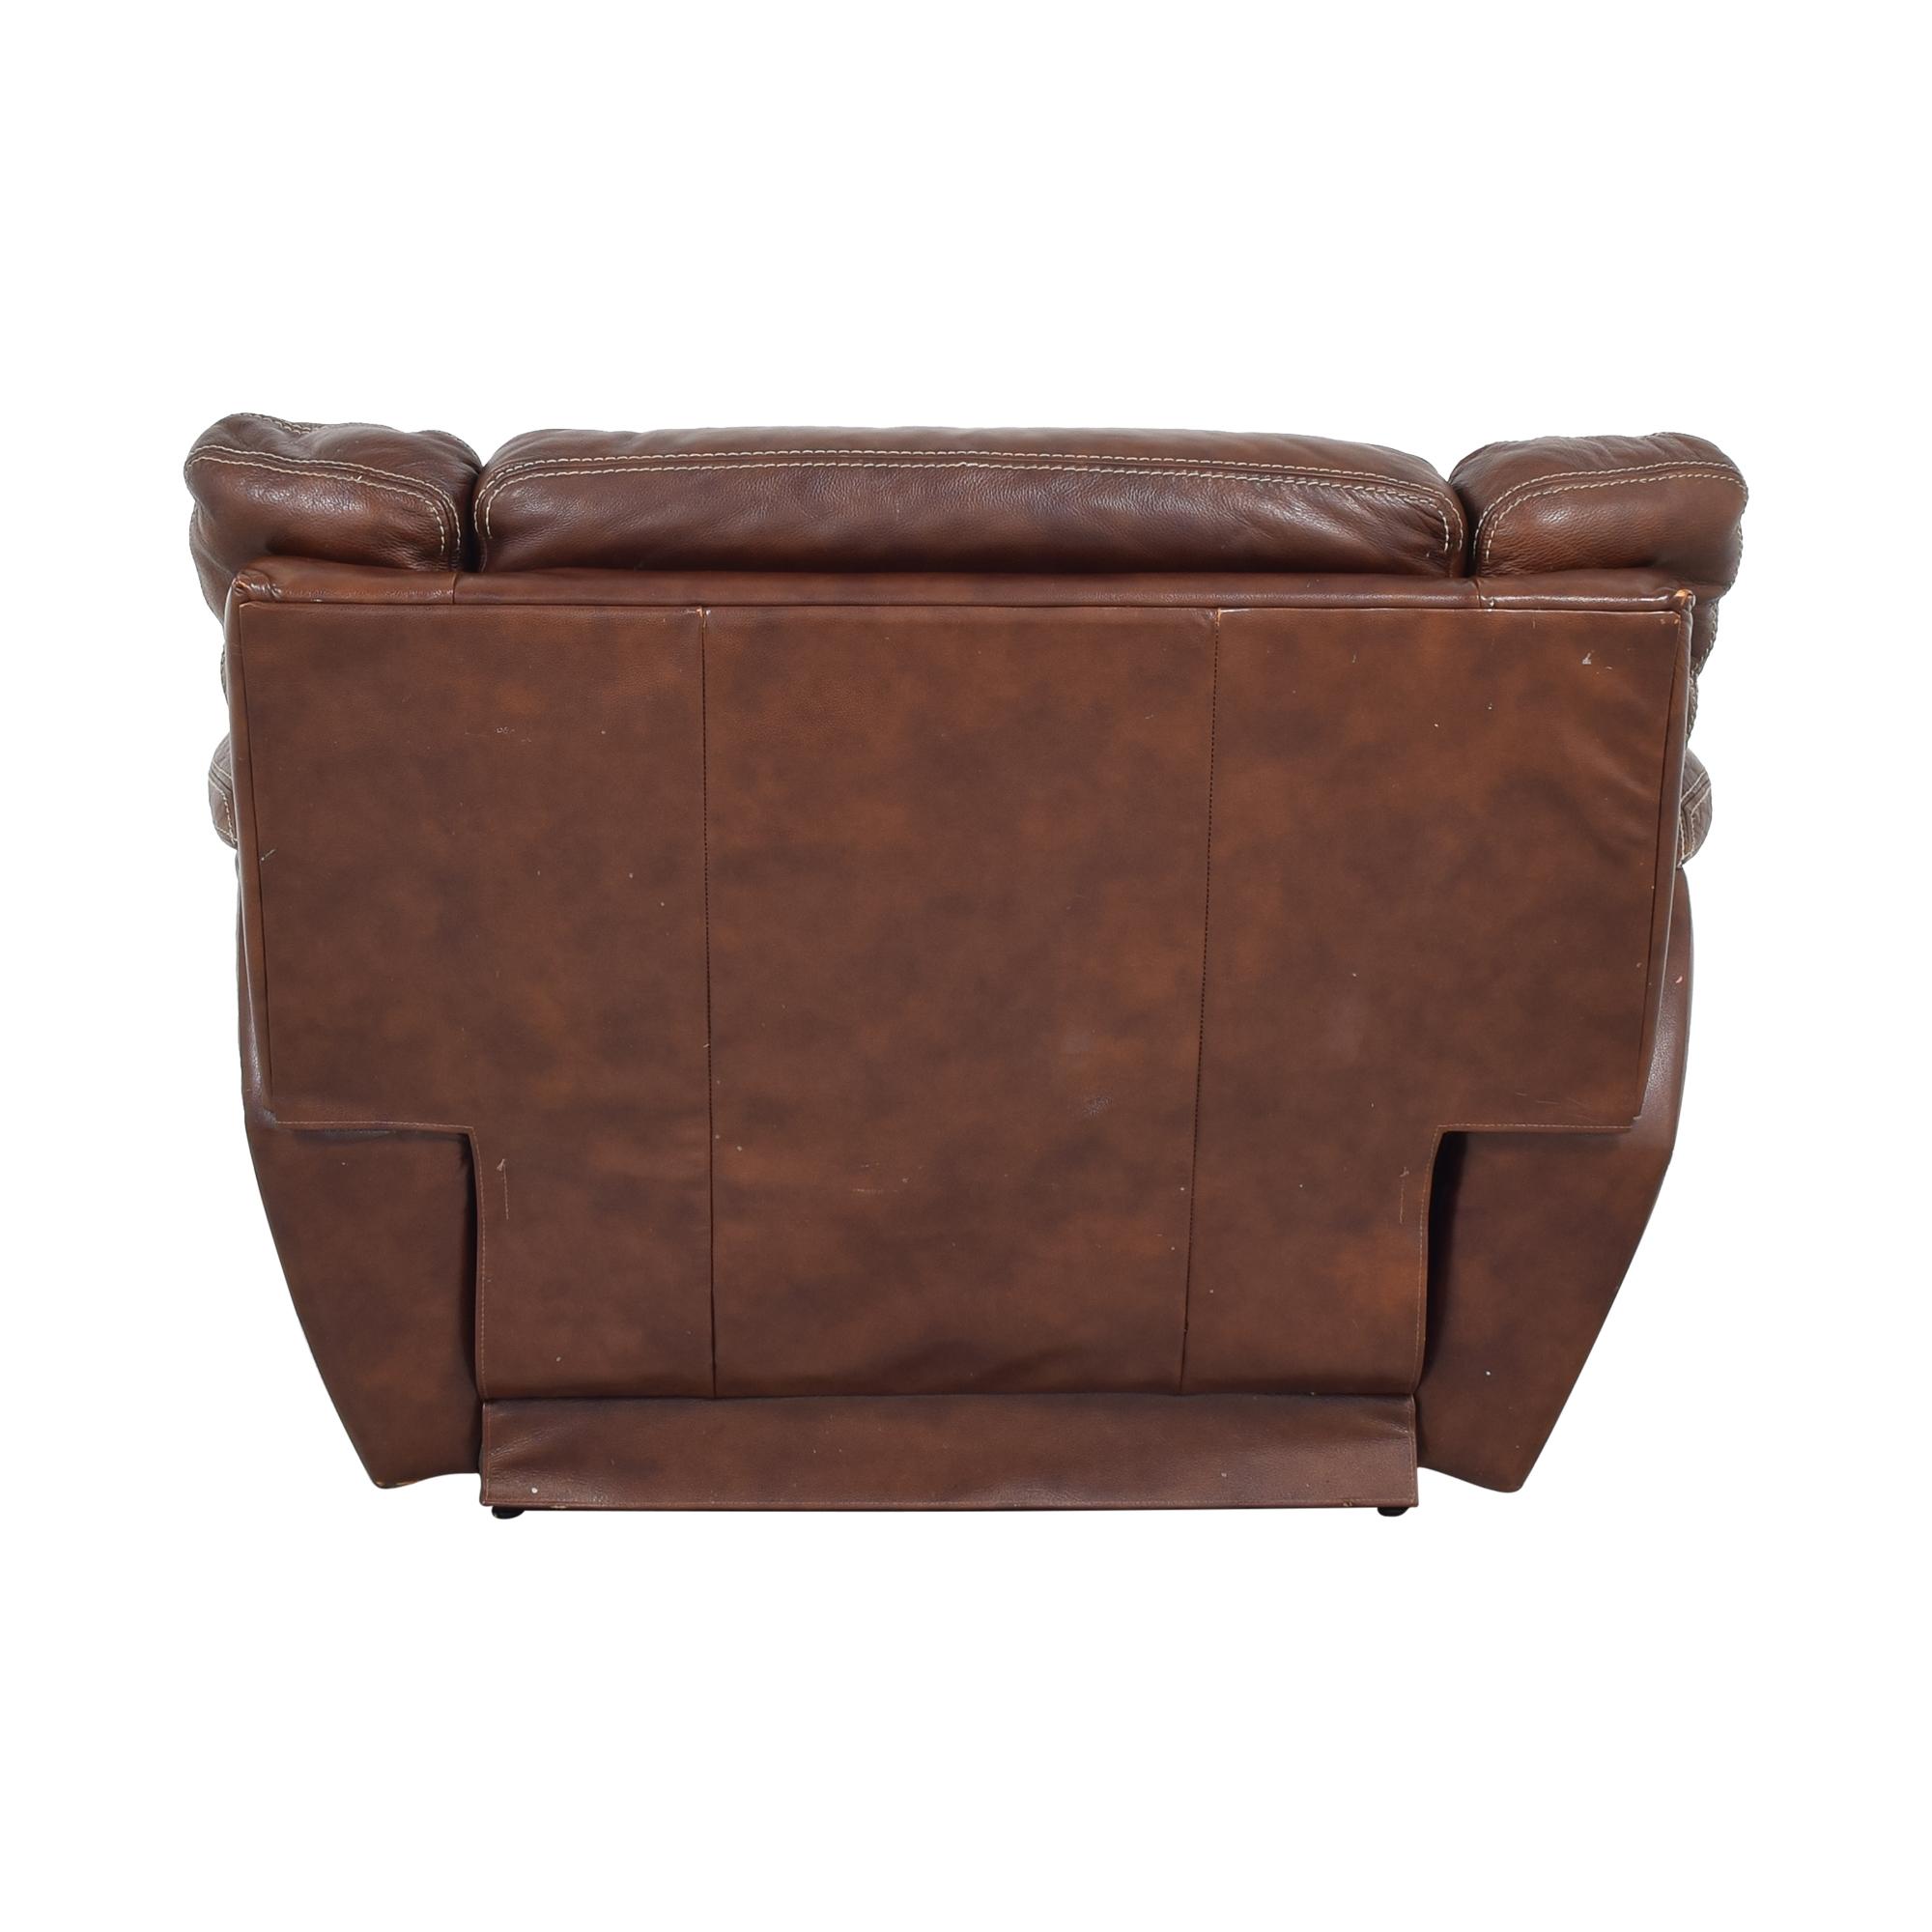 La-Z-Boy La-Z-Boy Leather Recliner Chair dark brown